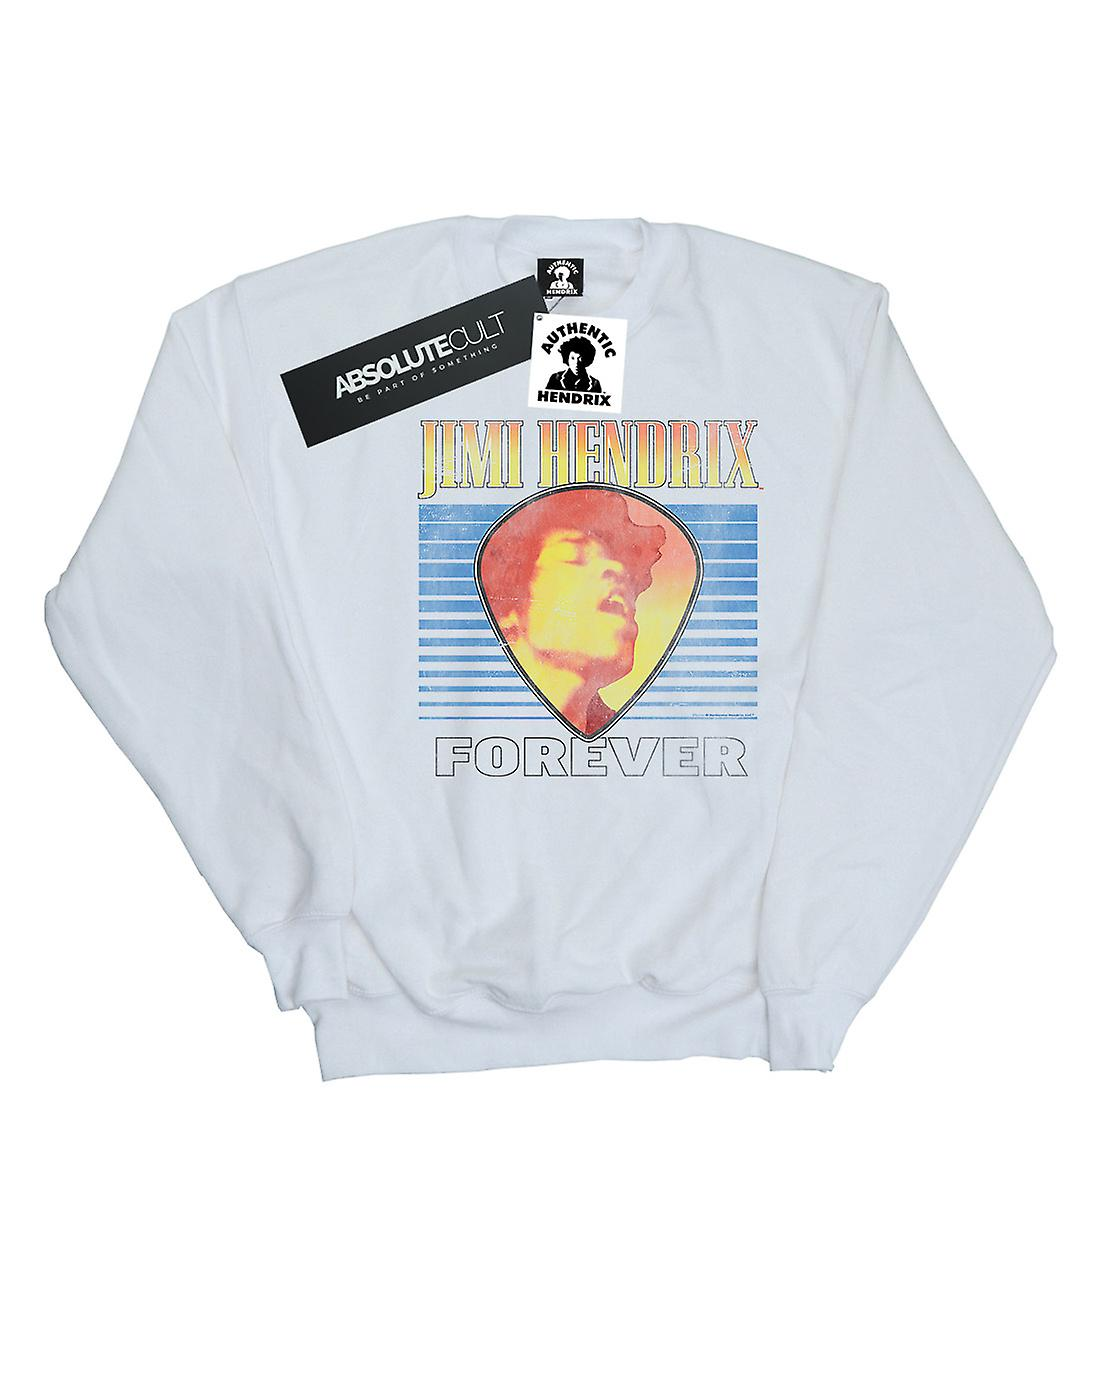 Jimi Hendrix Boys Retro Forever Sweatshirt